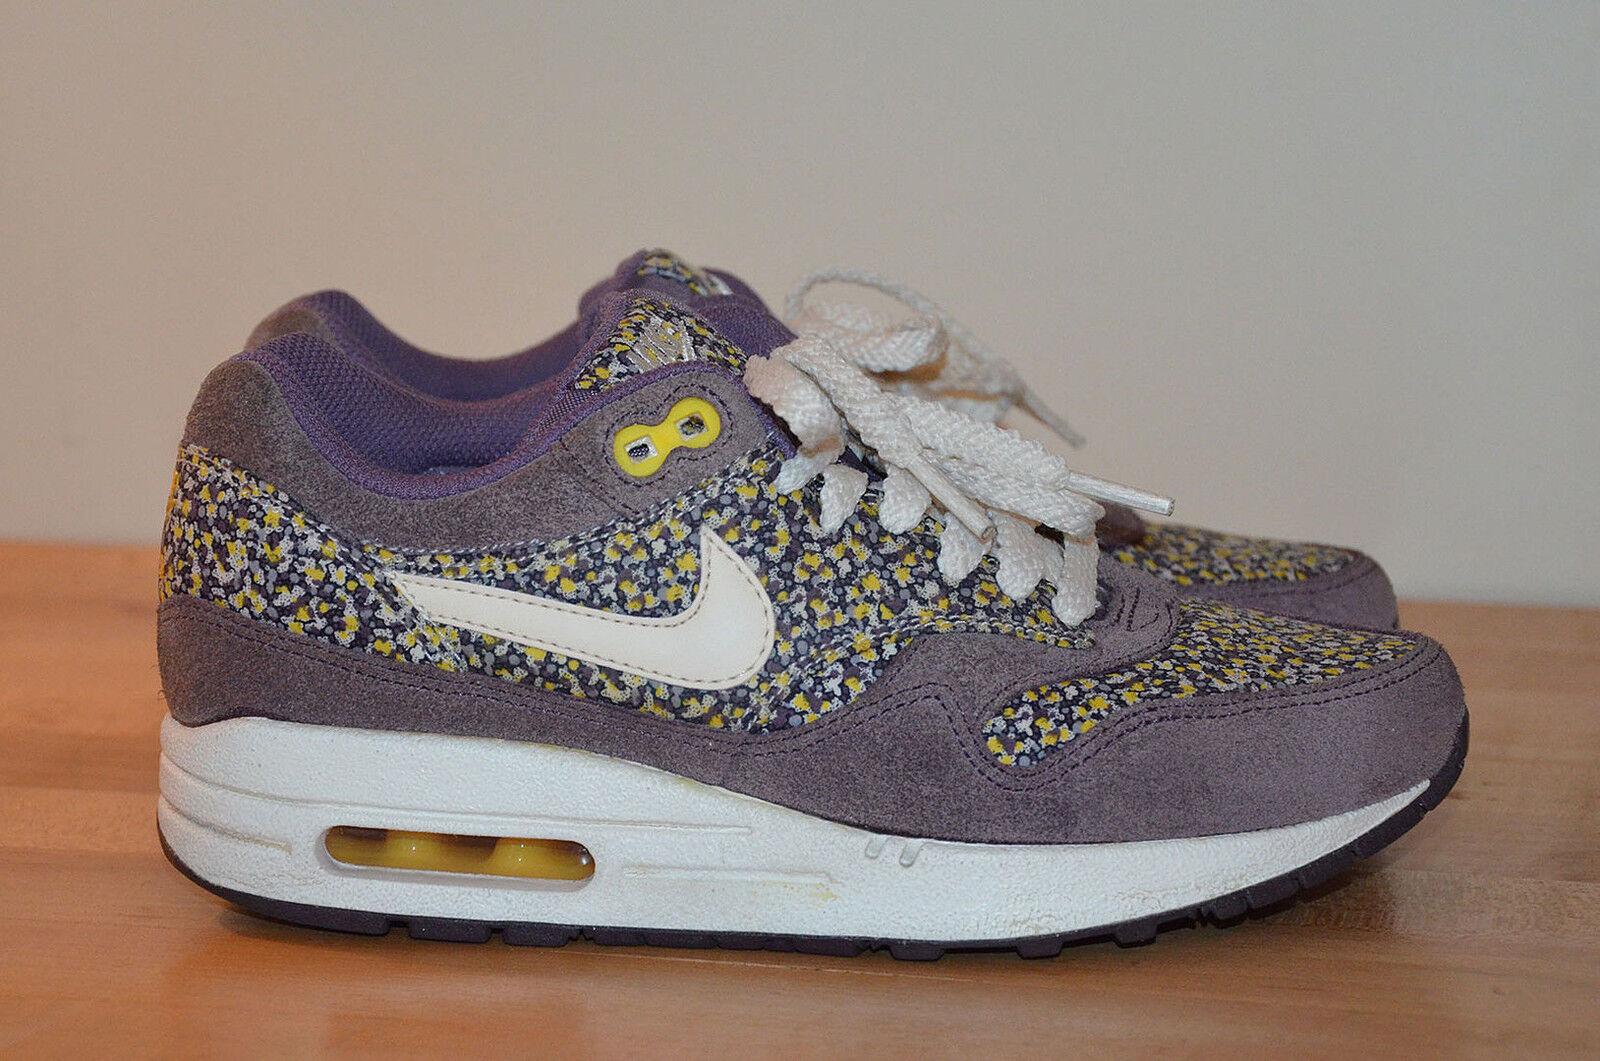 Nike Liberty Of London Air Max 1 ND LIB Plum Floral Sneakers 528712-501 sz 5